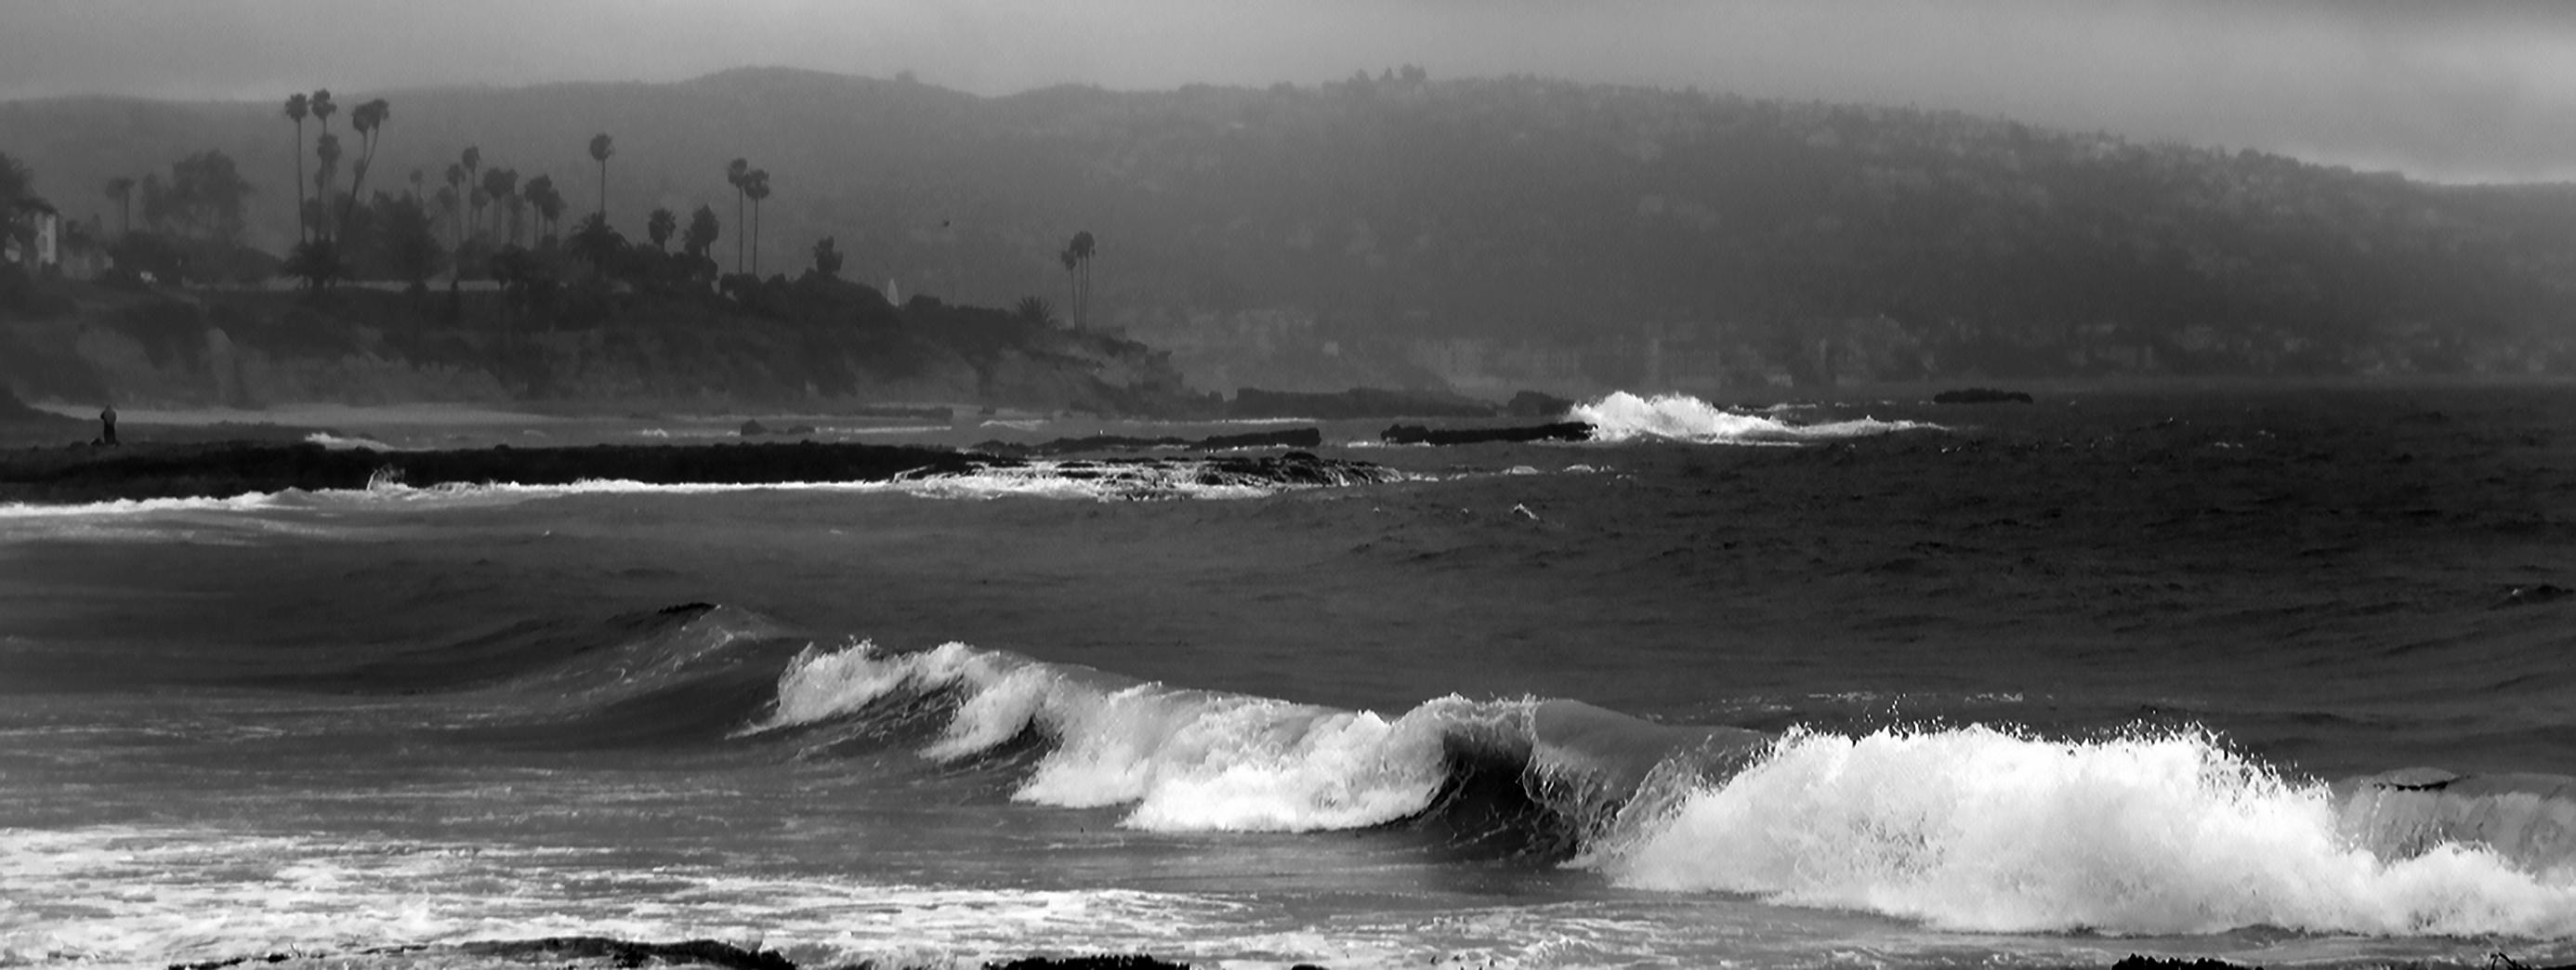 Beach-BW_1501-W